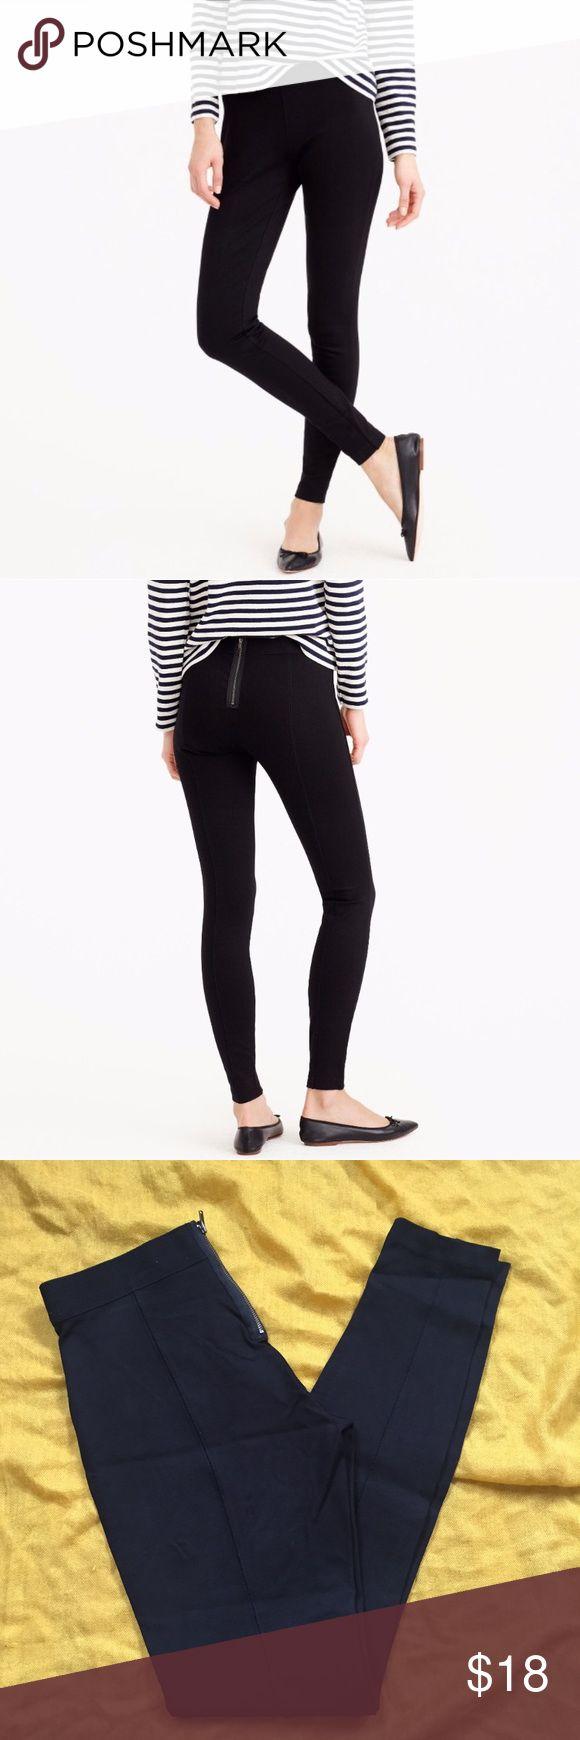 JCrew Petite Leggings JCrew Petite Leggings with zipper in the back. J. Crew Pants Leggings